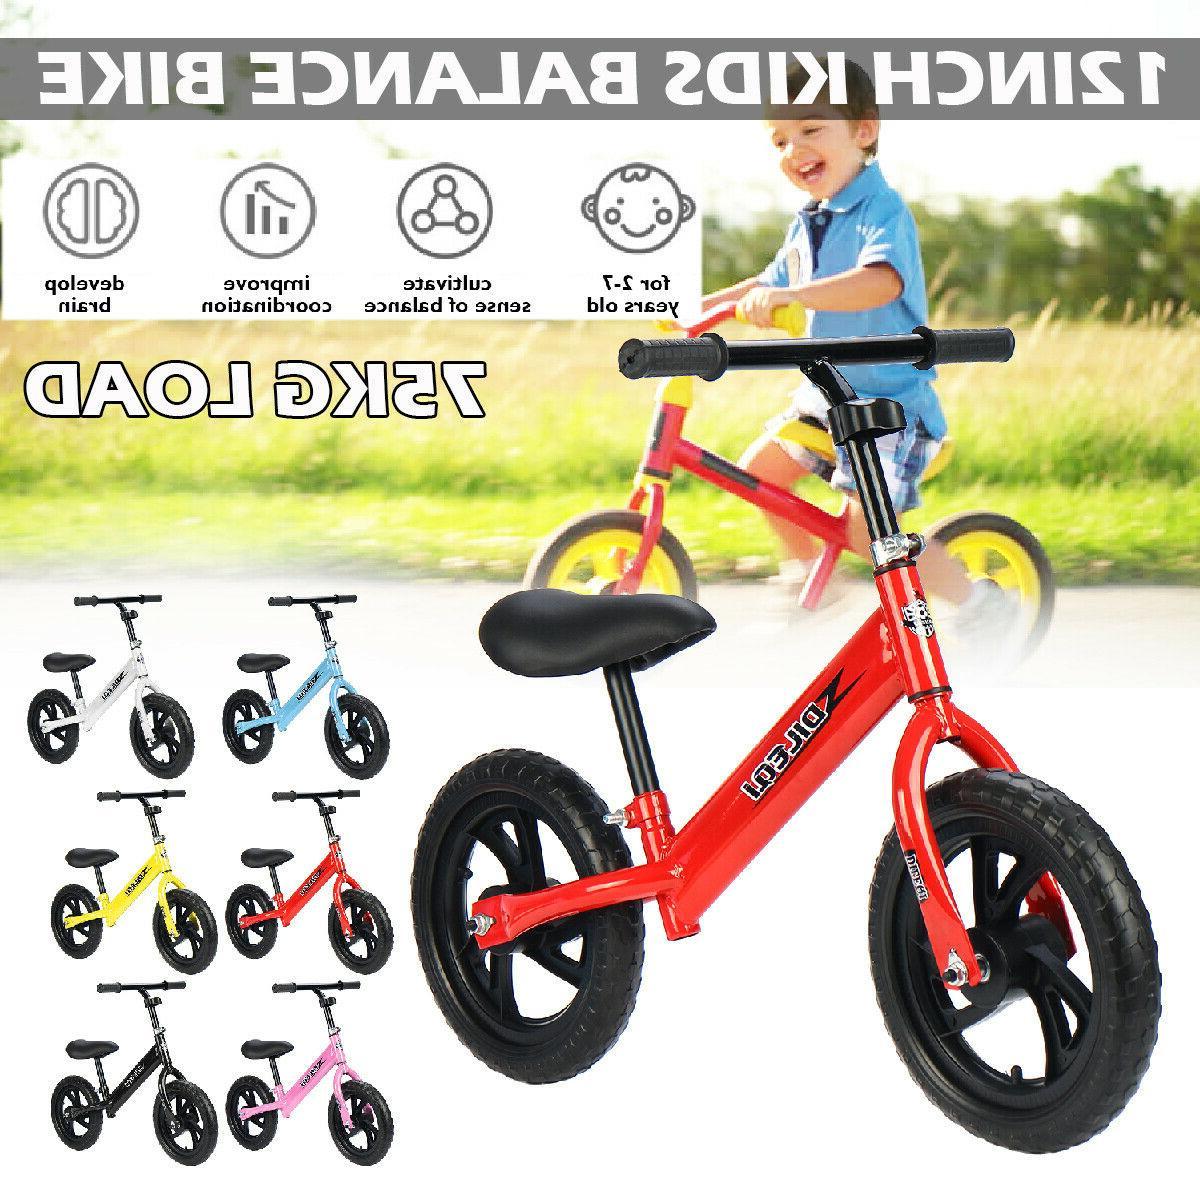 Kids No Bicycle w/ Adjustable Seat